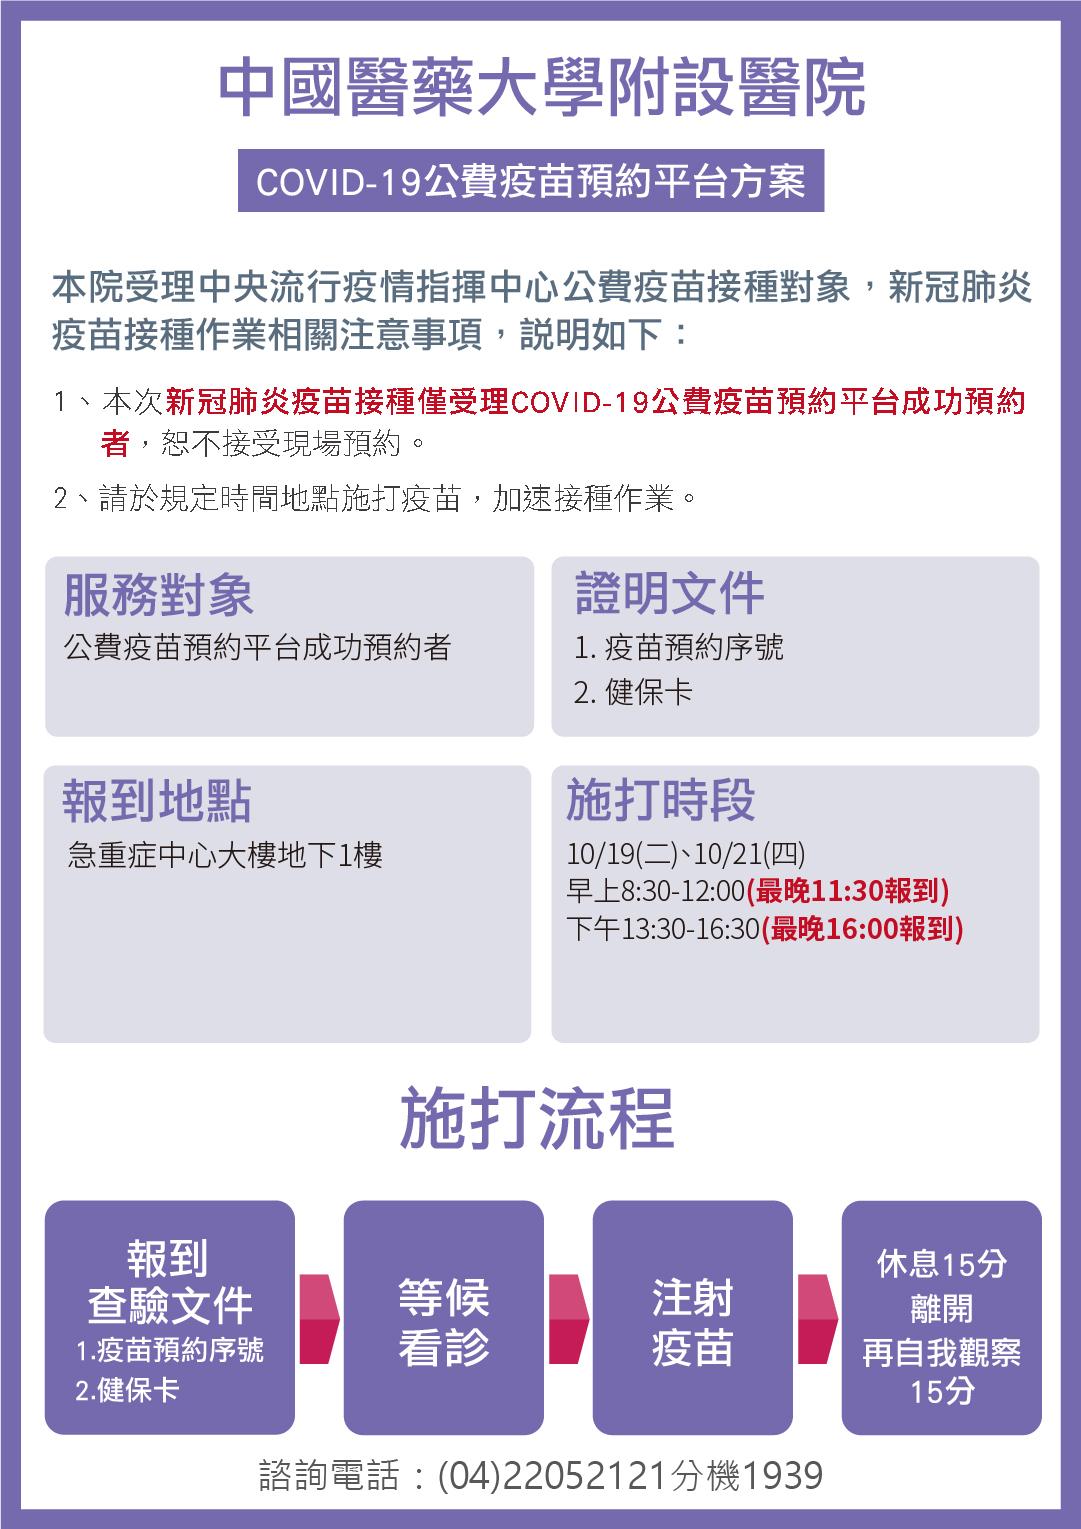 COVID-19公費疫苗預約平台